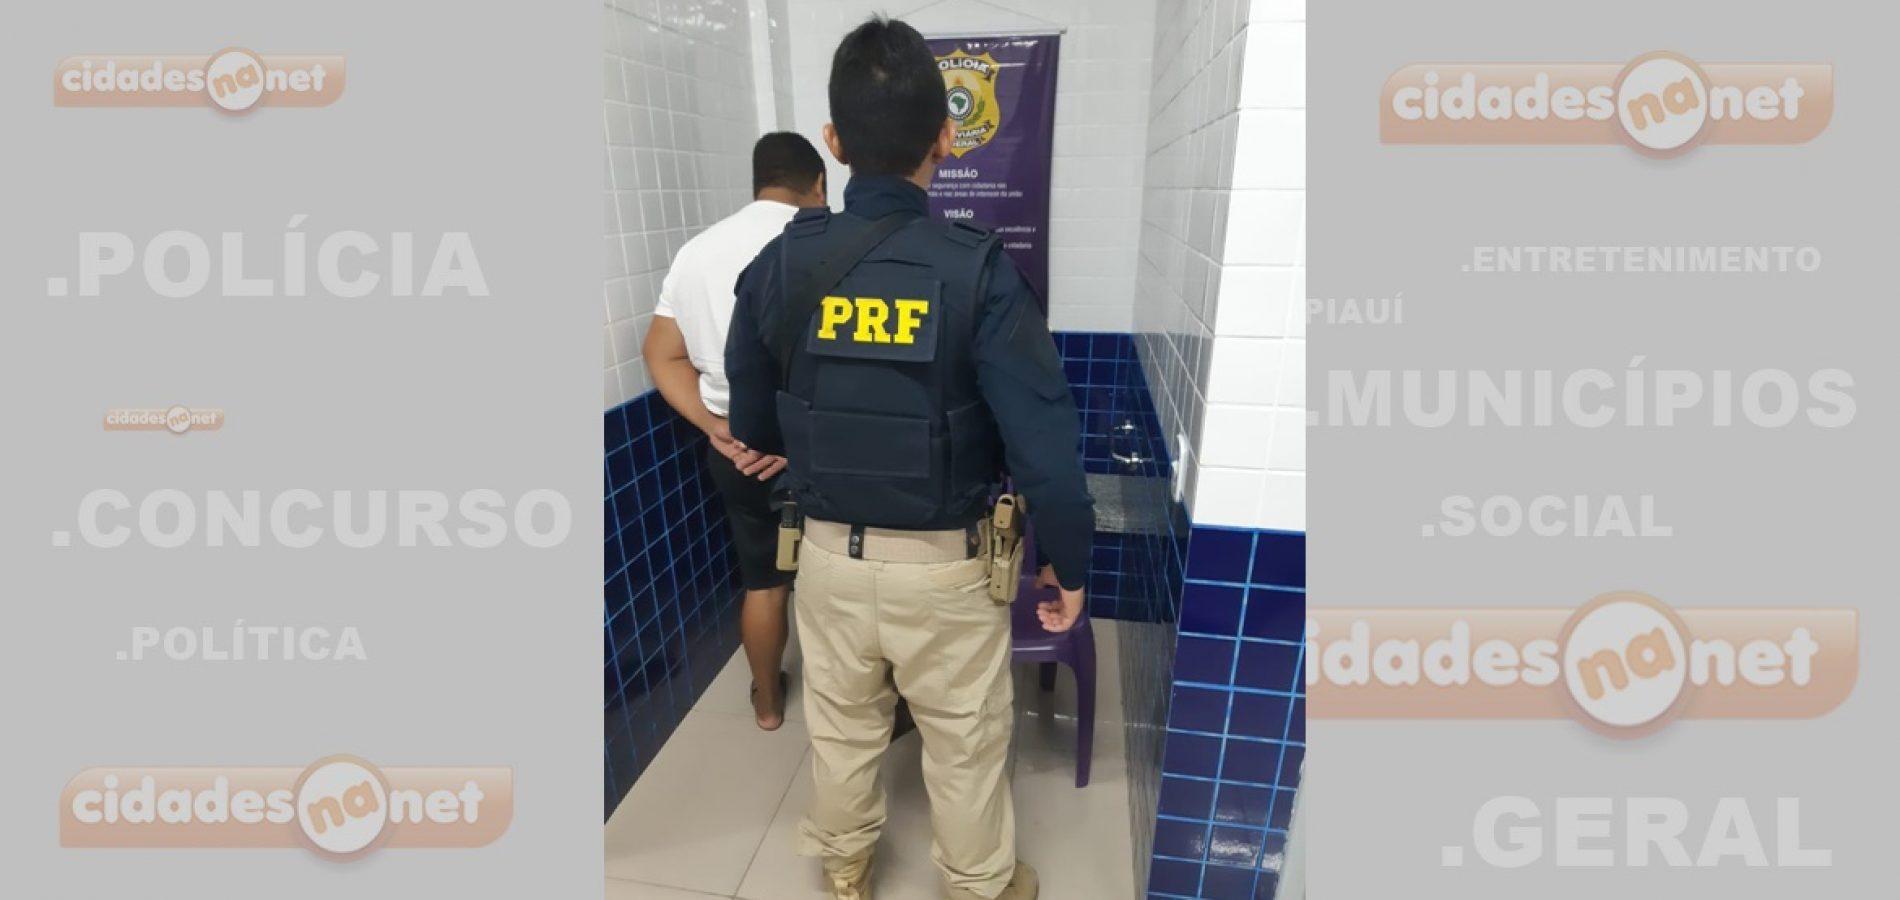 PRF prende homem suspeito de estelionato e apreende cheques